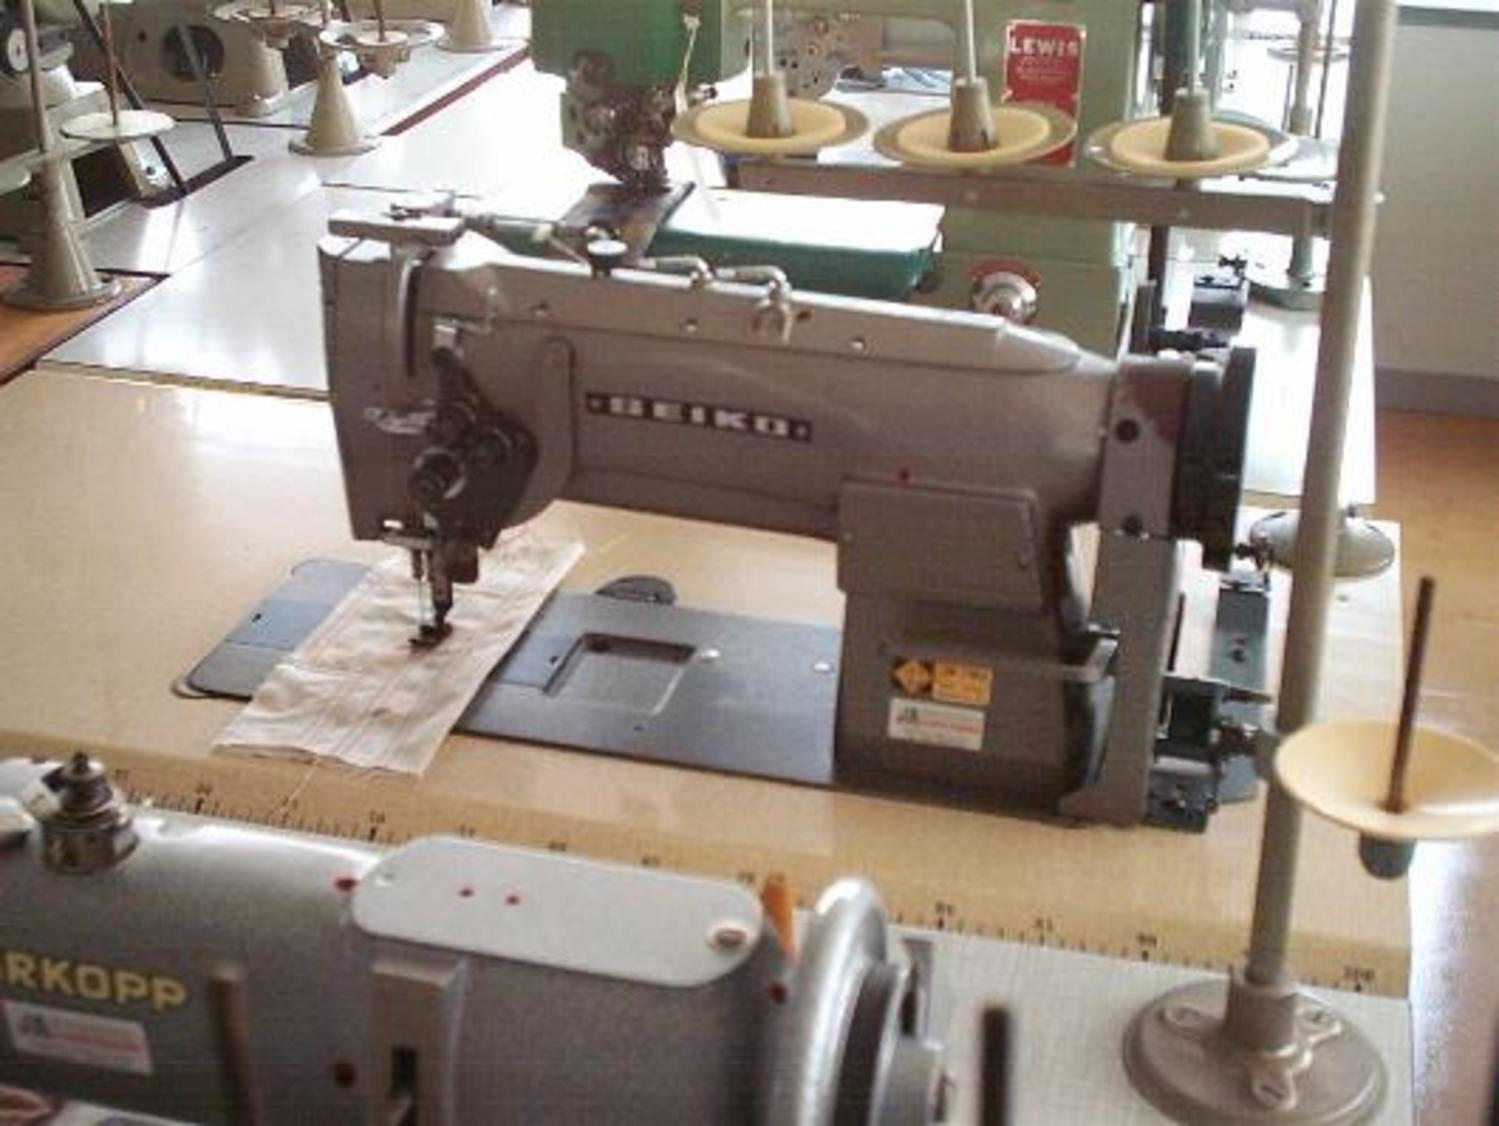 Nähmaschine Seiko LSW 27BLK